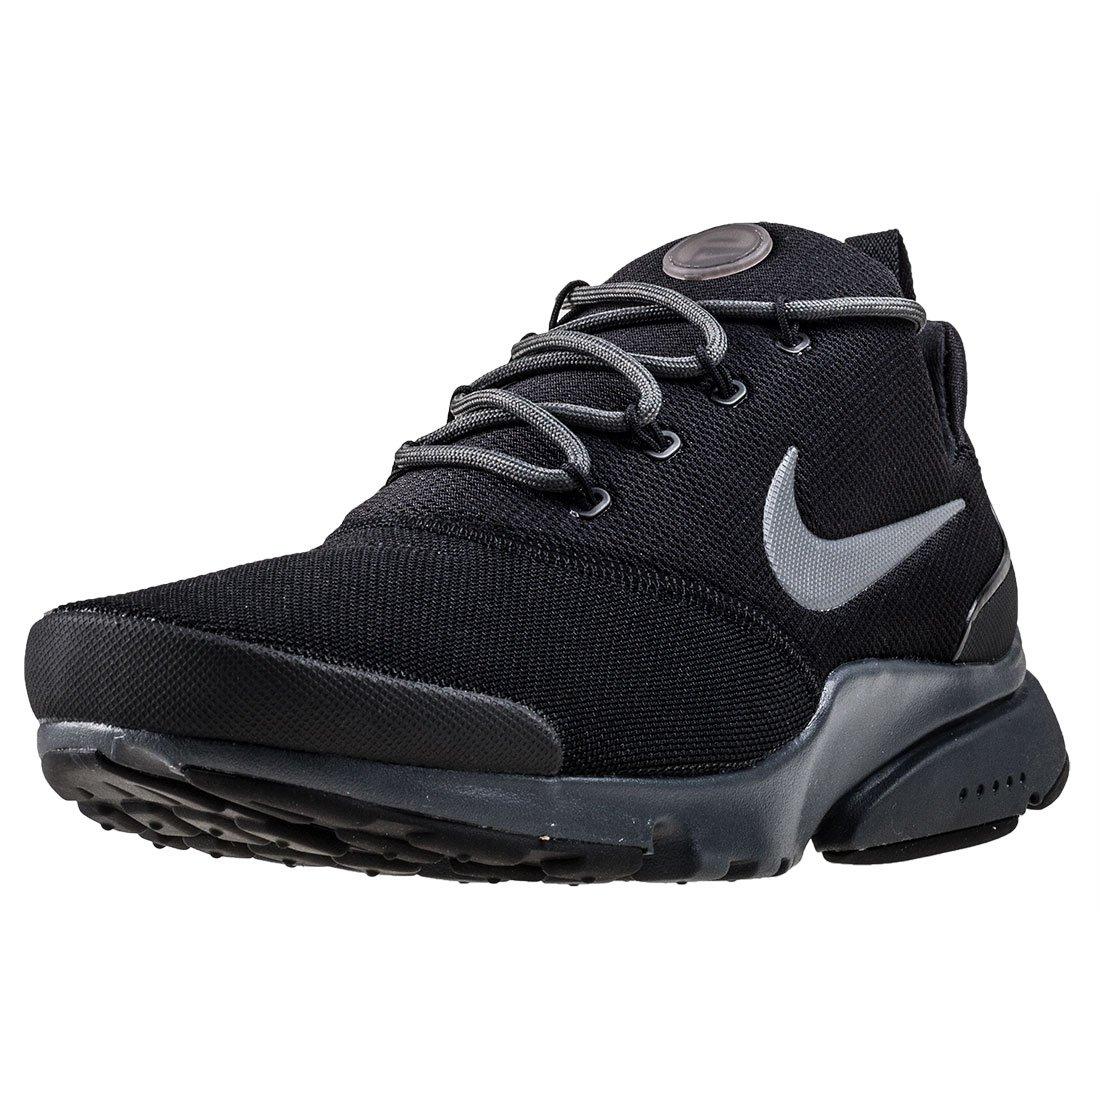 Ajuste clásico Nike Hombre Presto Fly Running Sneaker Zapatos Negro Anthracite 679MC